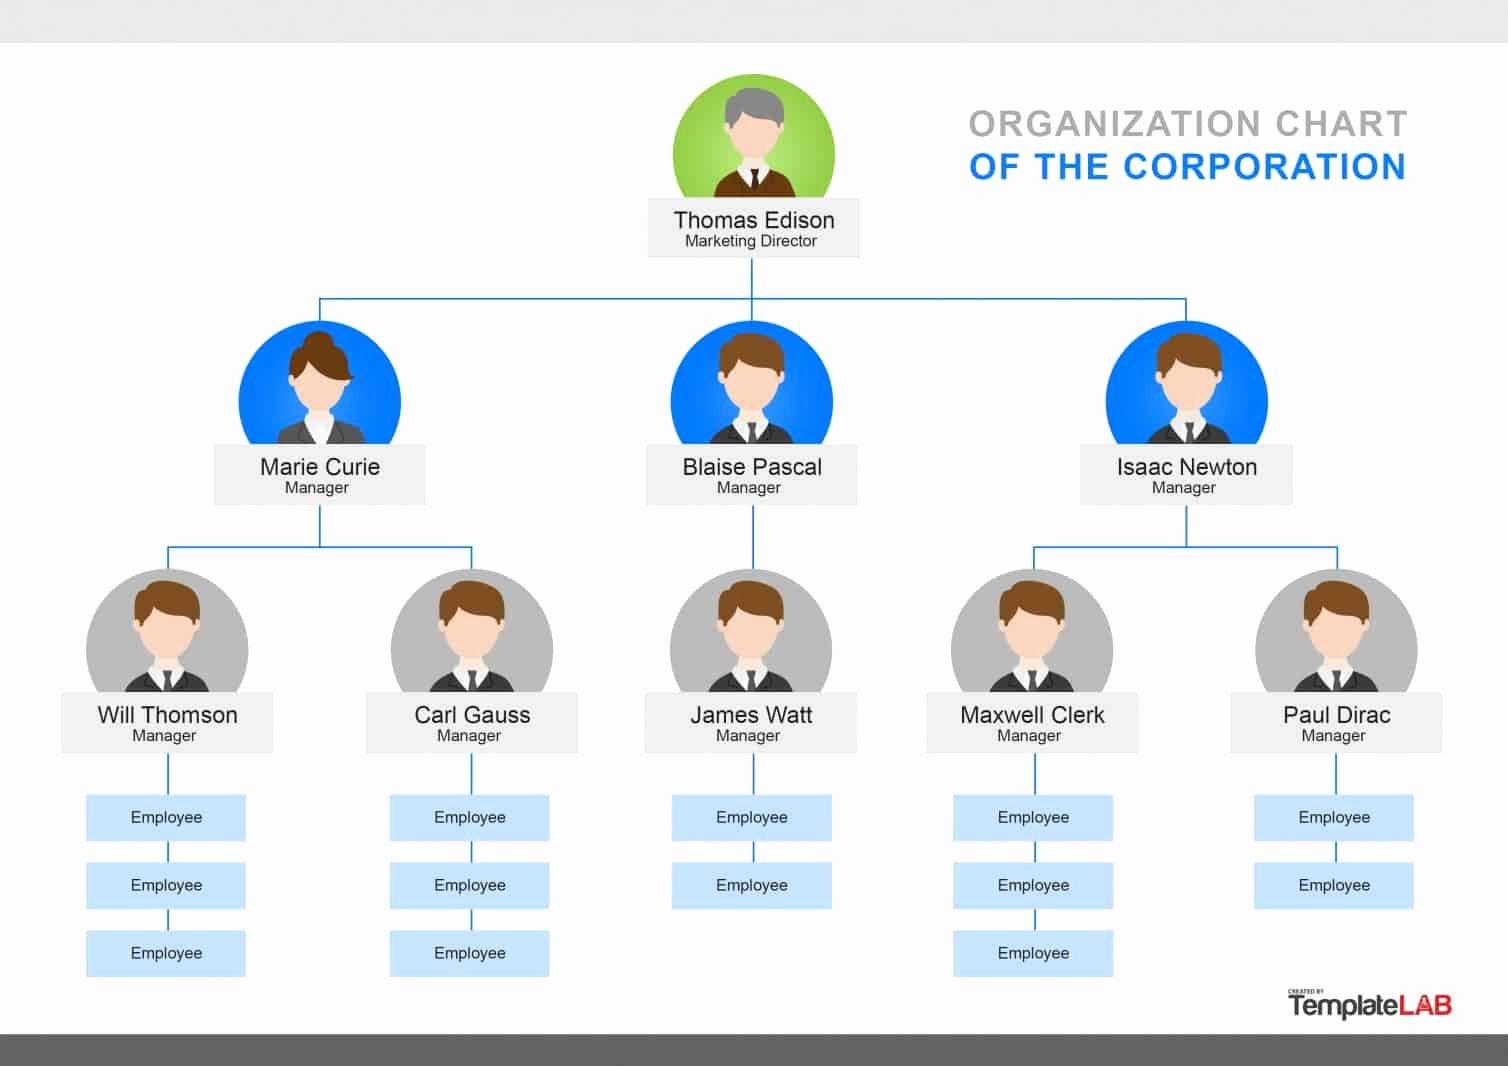 Free organizational Chart Template Word Inspirational 40 organizational Chart Templates Word Excel Powerpoint